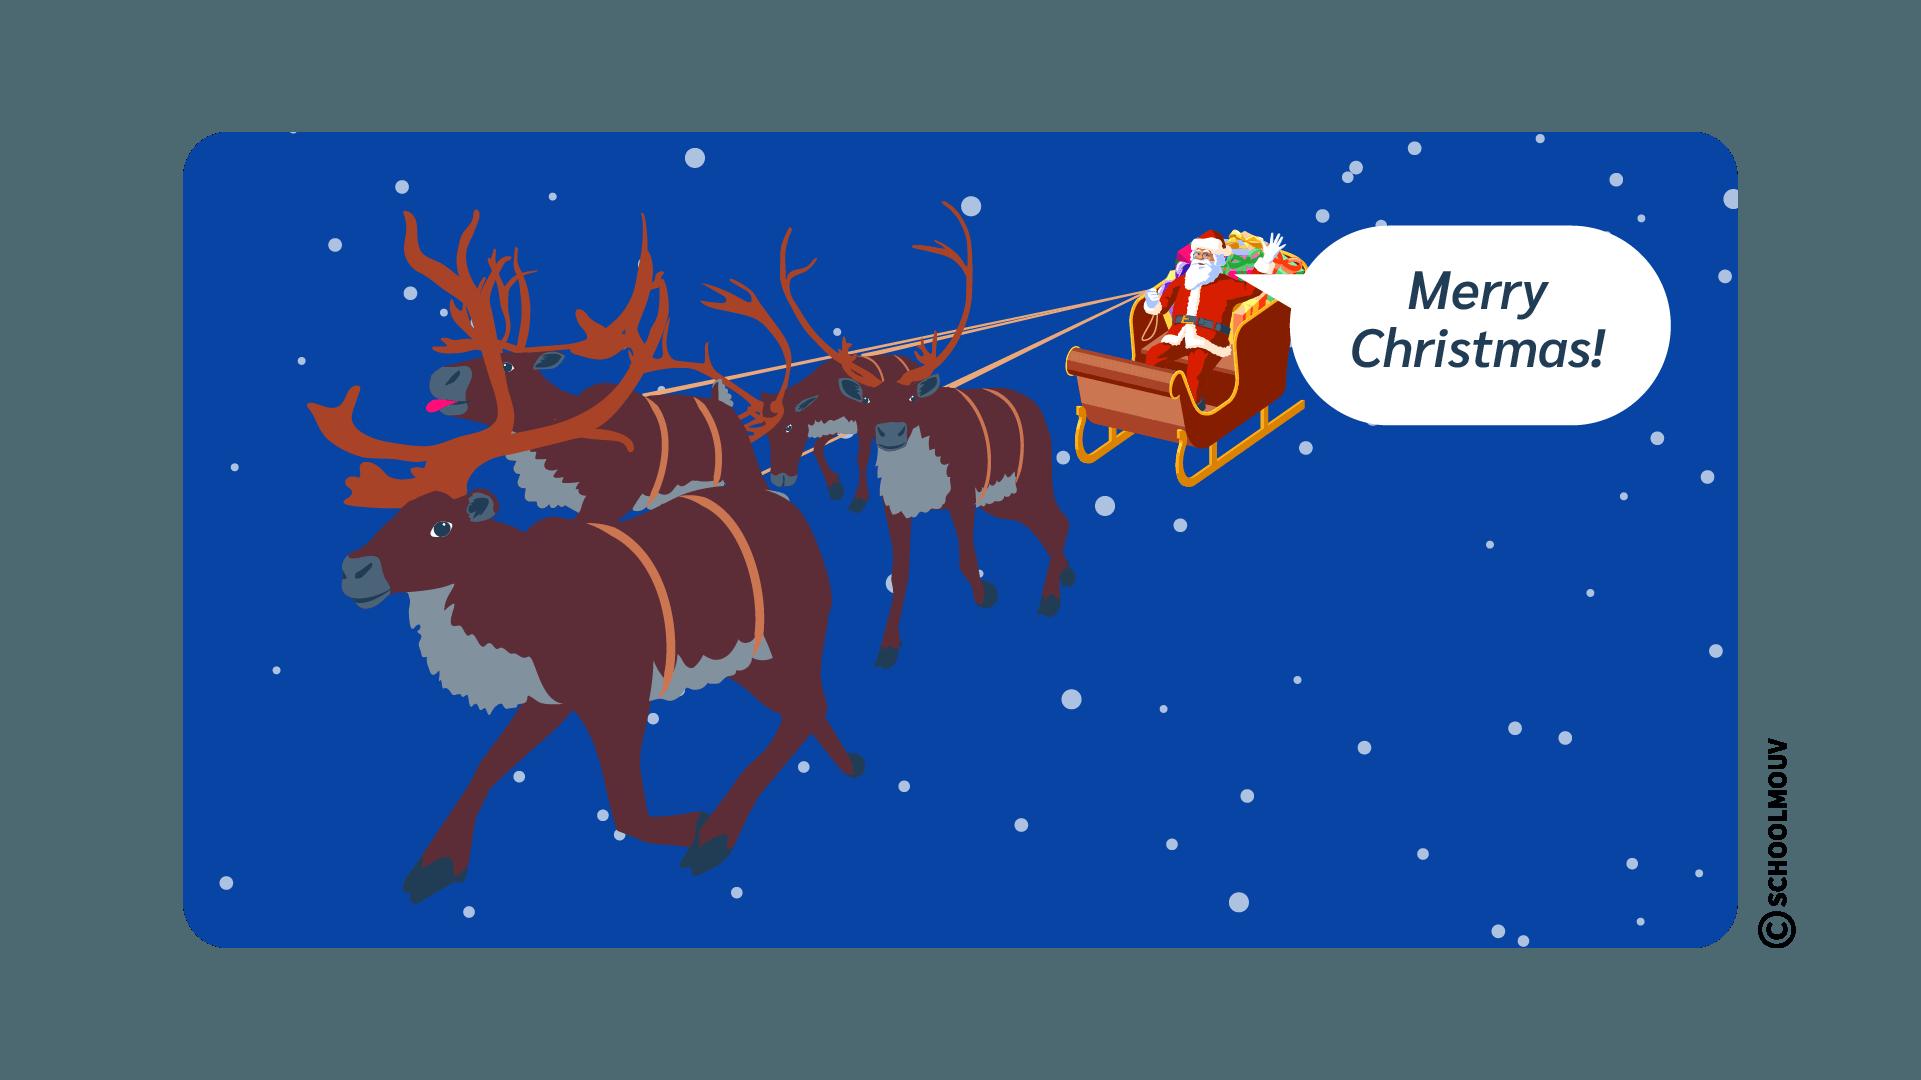 merry christmas anglais souhaiter fêtes